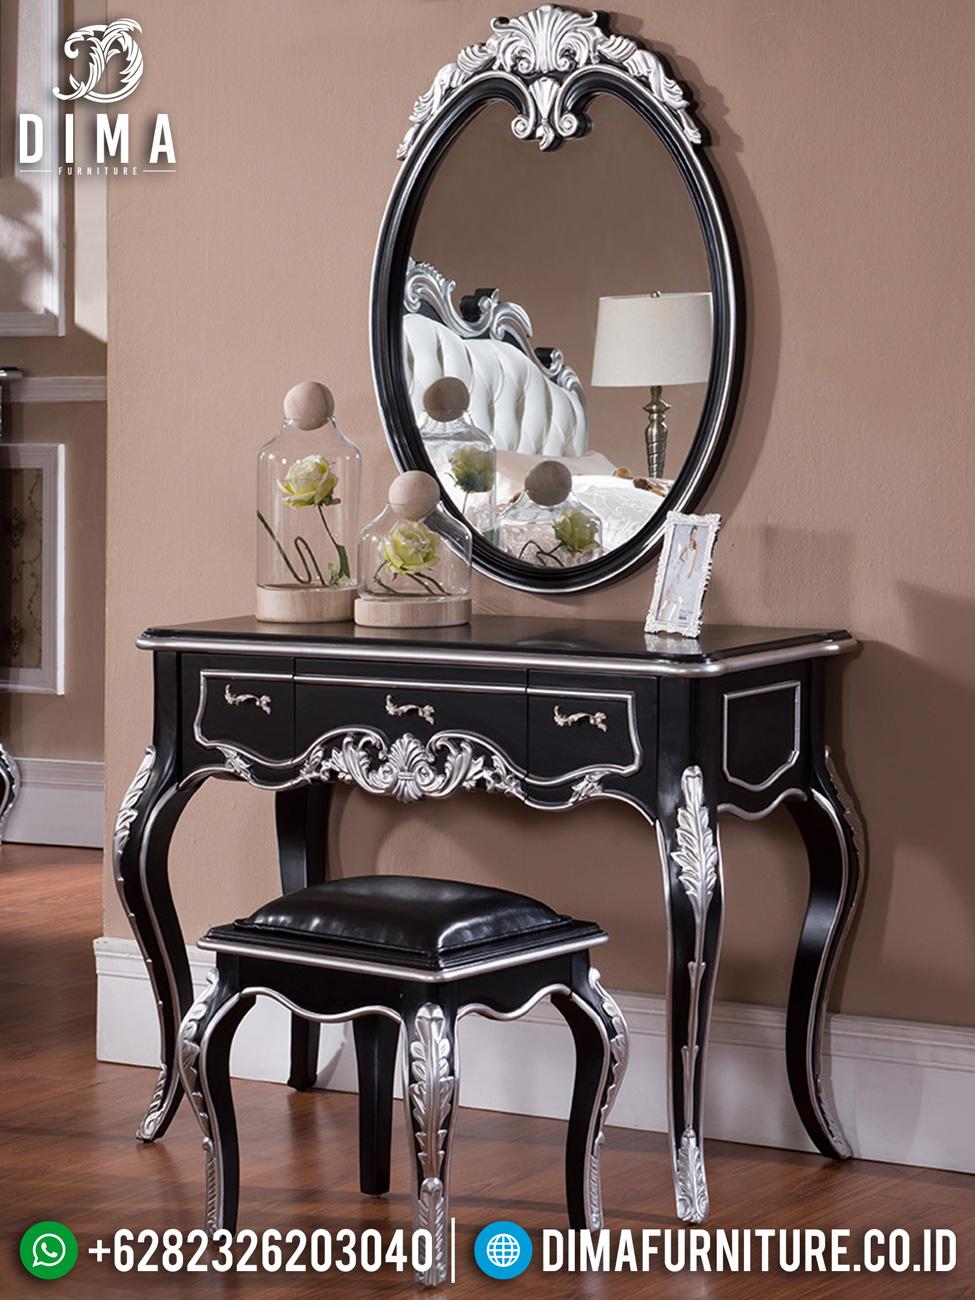 Meja Rias Mewah Jepara Luxury Carving Black Edition Color Ttj-1541